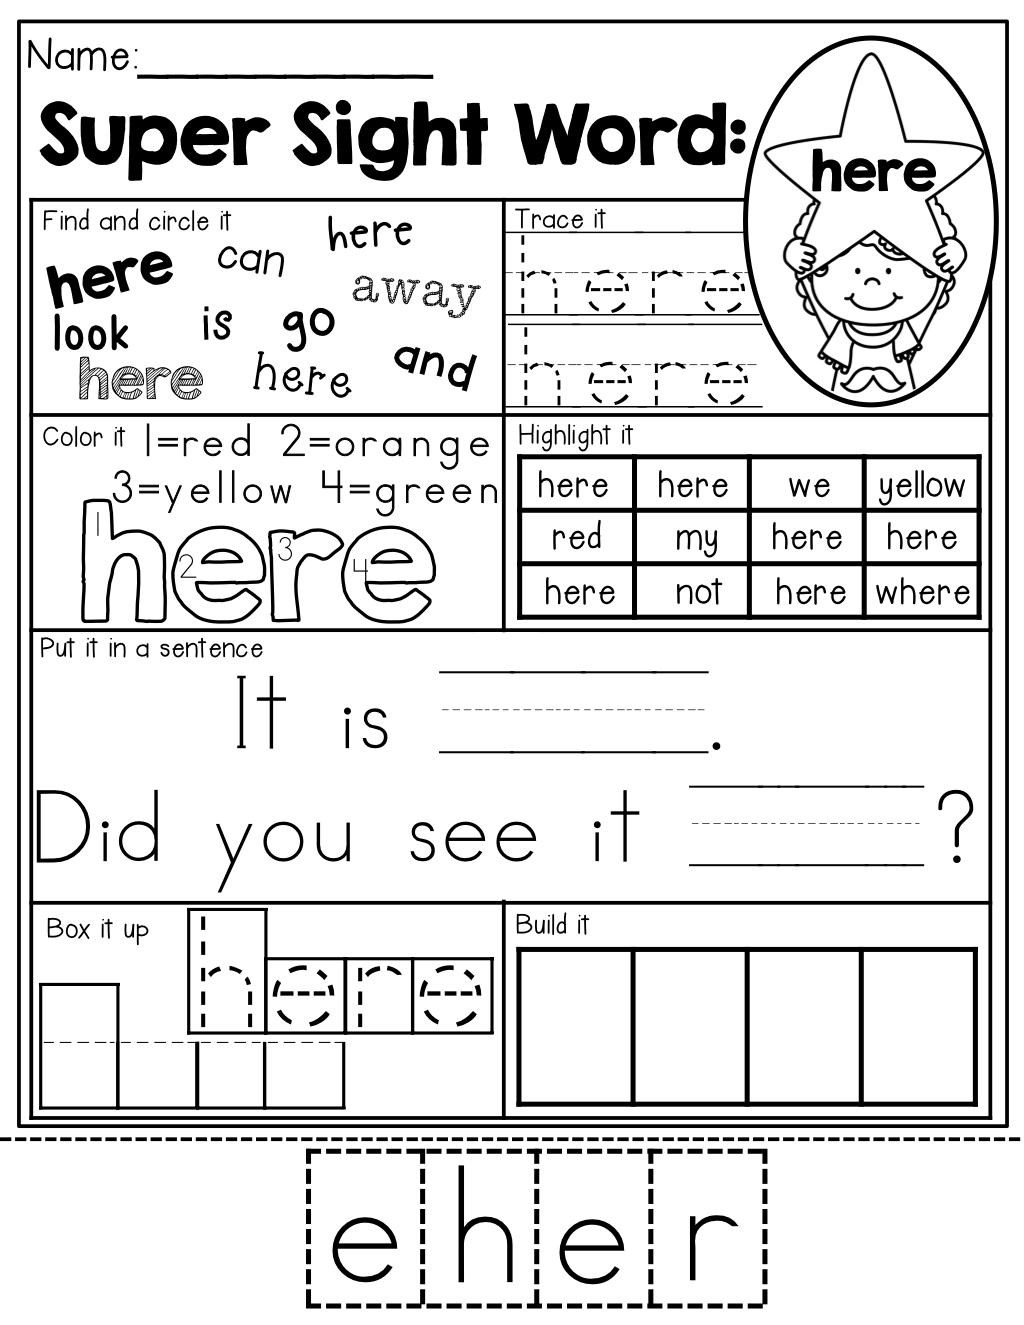 cb64f27ded6dbba07cfc8c778cb627a5 - Sight Word Kindergarten